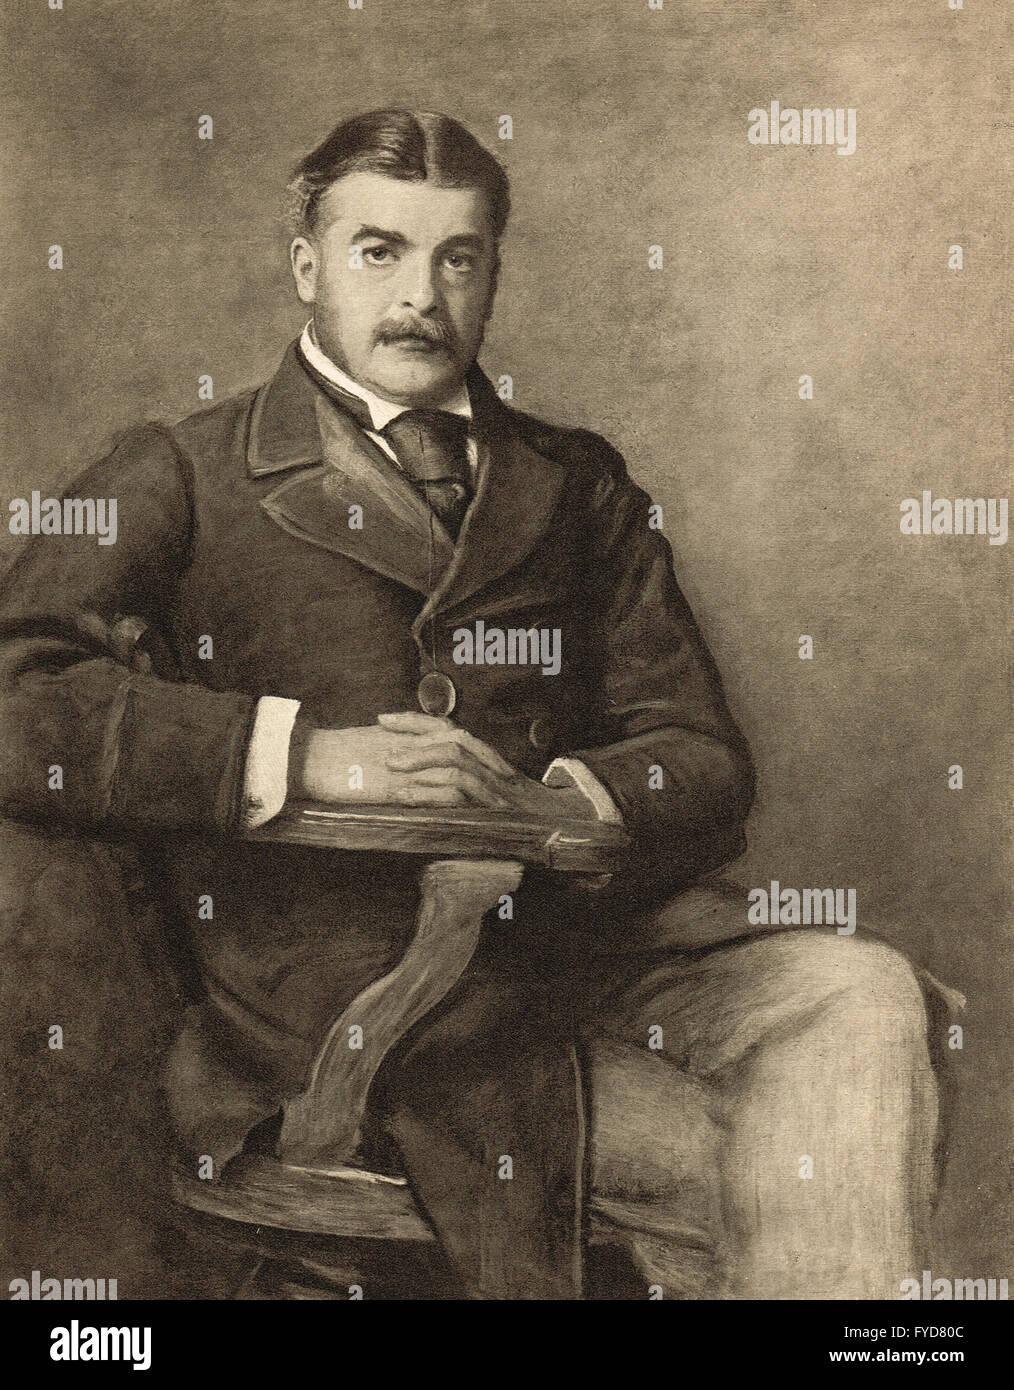 Sir Arthur Sullivan, Composer 1842-1900 - Stock Image